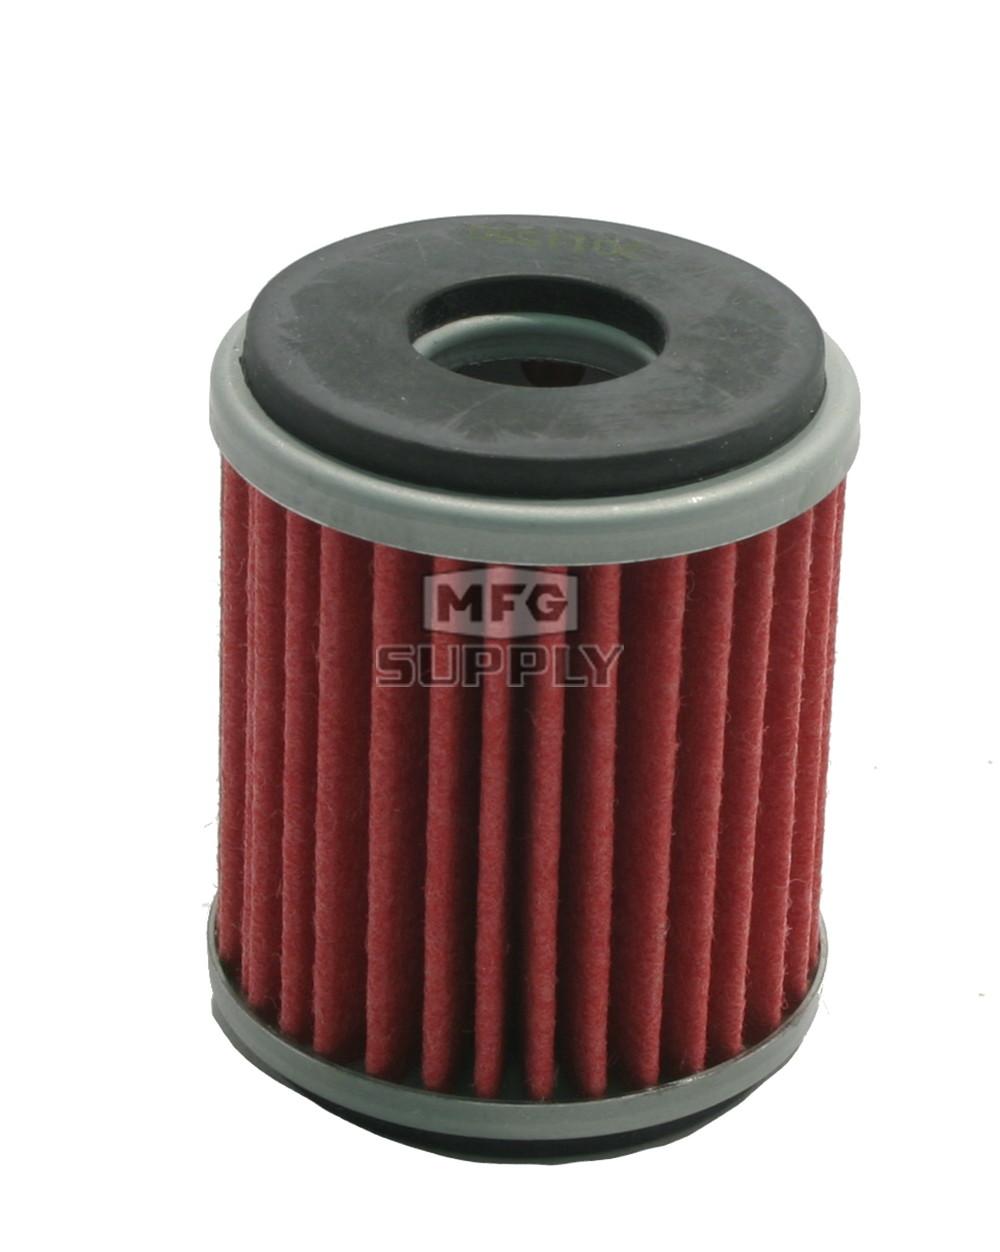 Filtre /à huile Nypso pour Quad Yamaha 450 YFM FX Wolverine 2006-2010 Neuf